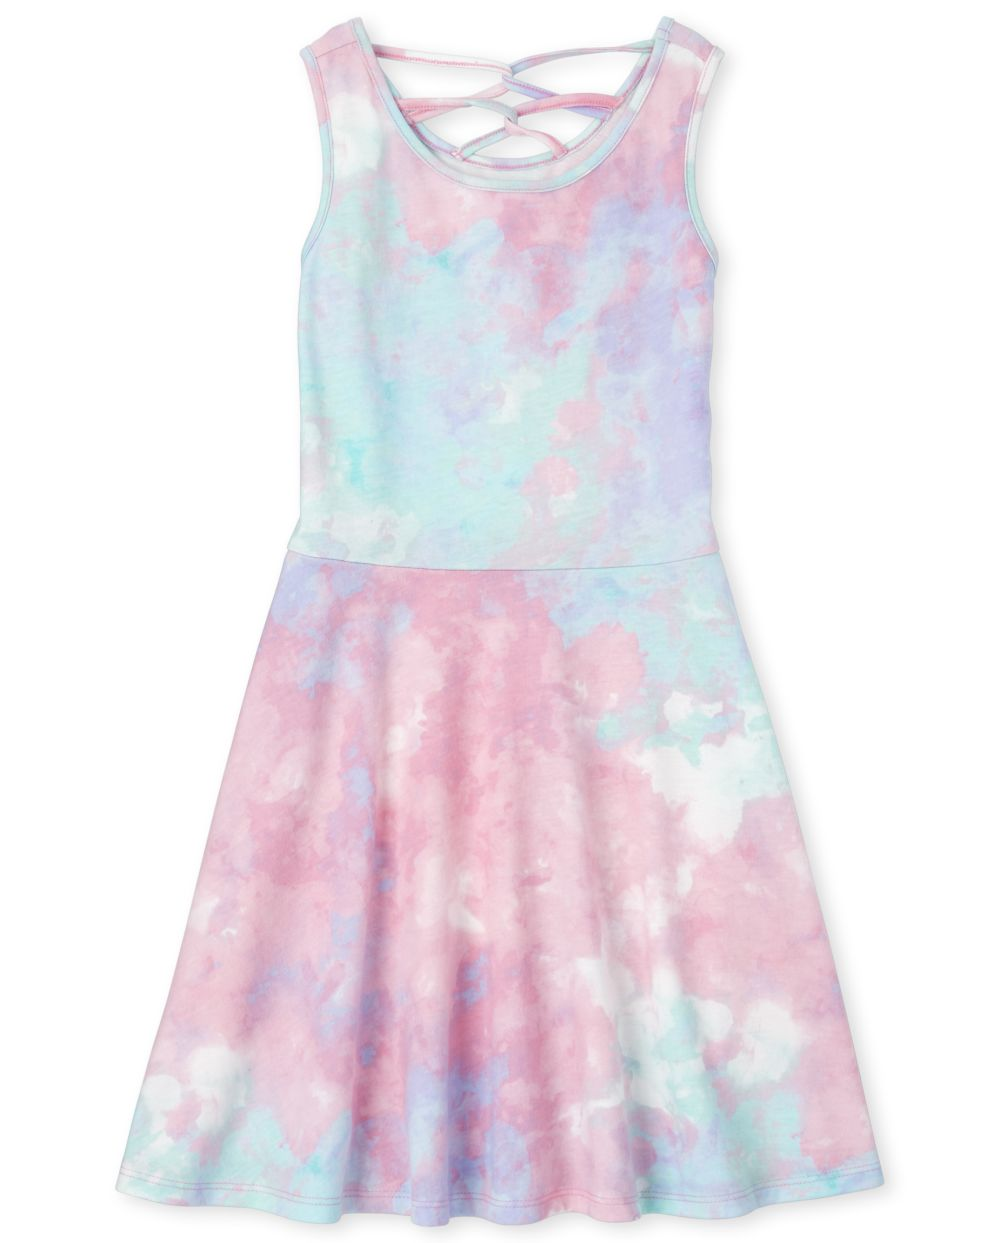 Girls Tie Dye Cut Out Dress